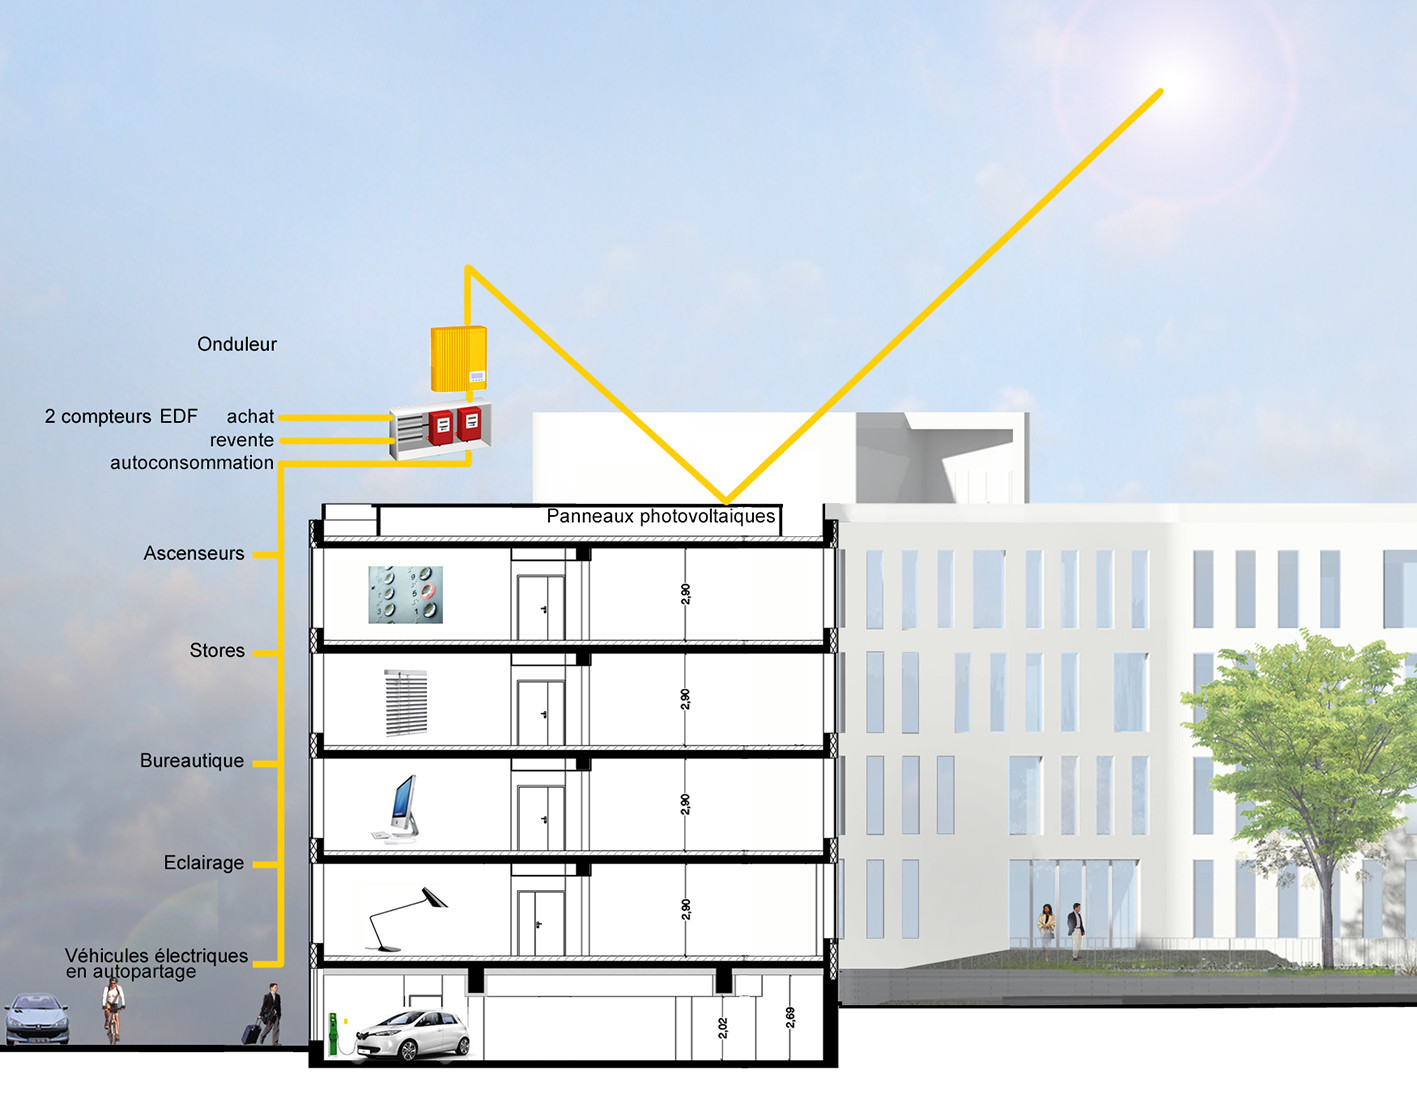 prd office building section diagram [ 1417 x 1104 Pixel ]